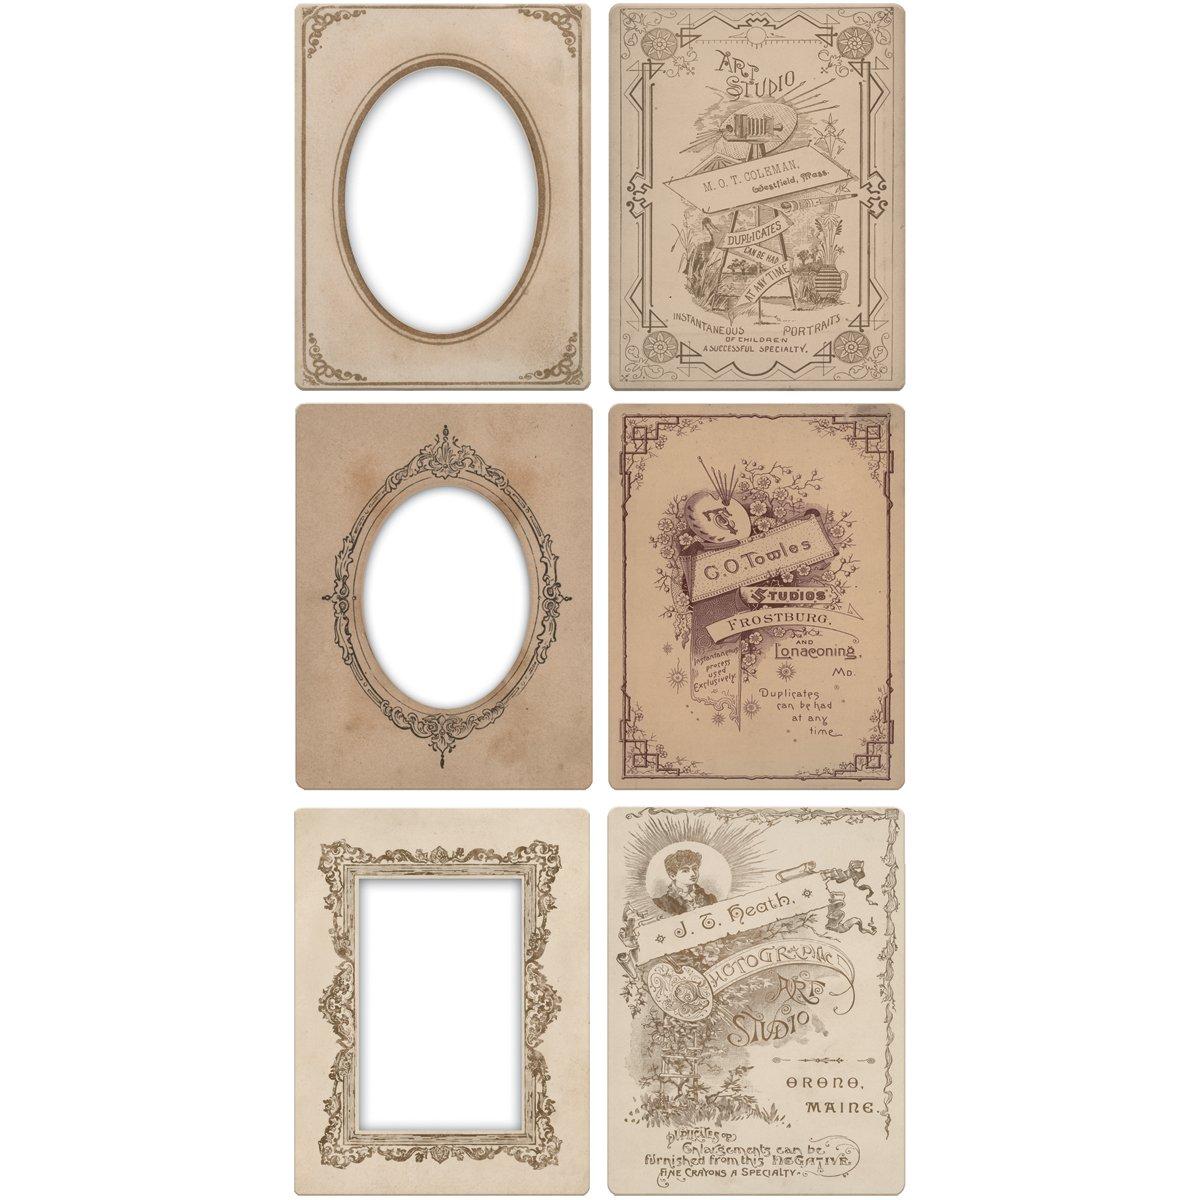 Mini Cabinet Card Frames by Tim Holtz Idea-ology, 6 per Pack, 3.25 x 4.25 Inches, TH93118 Advantus Corp.